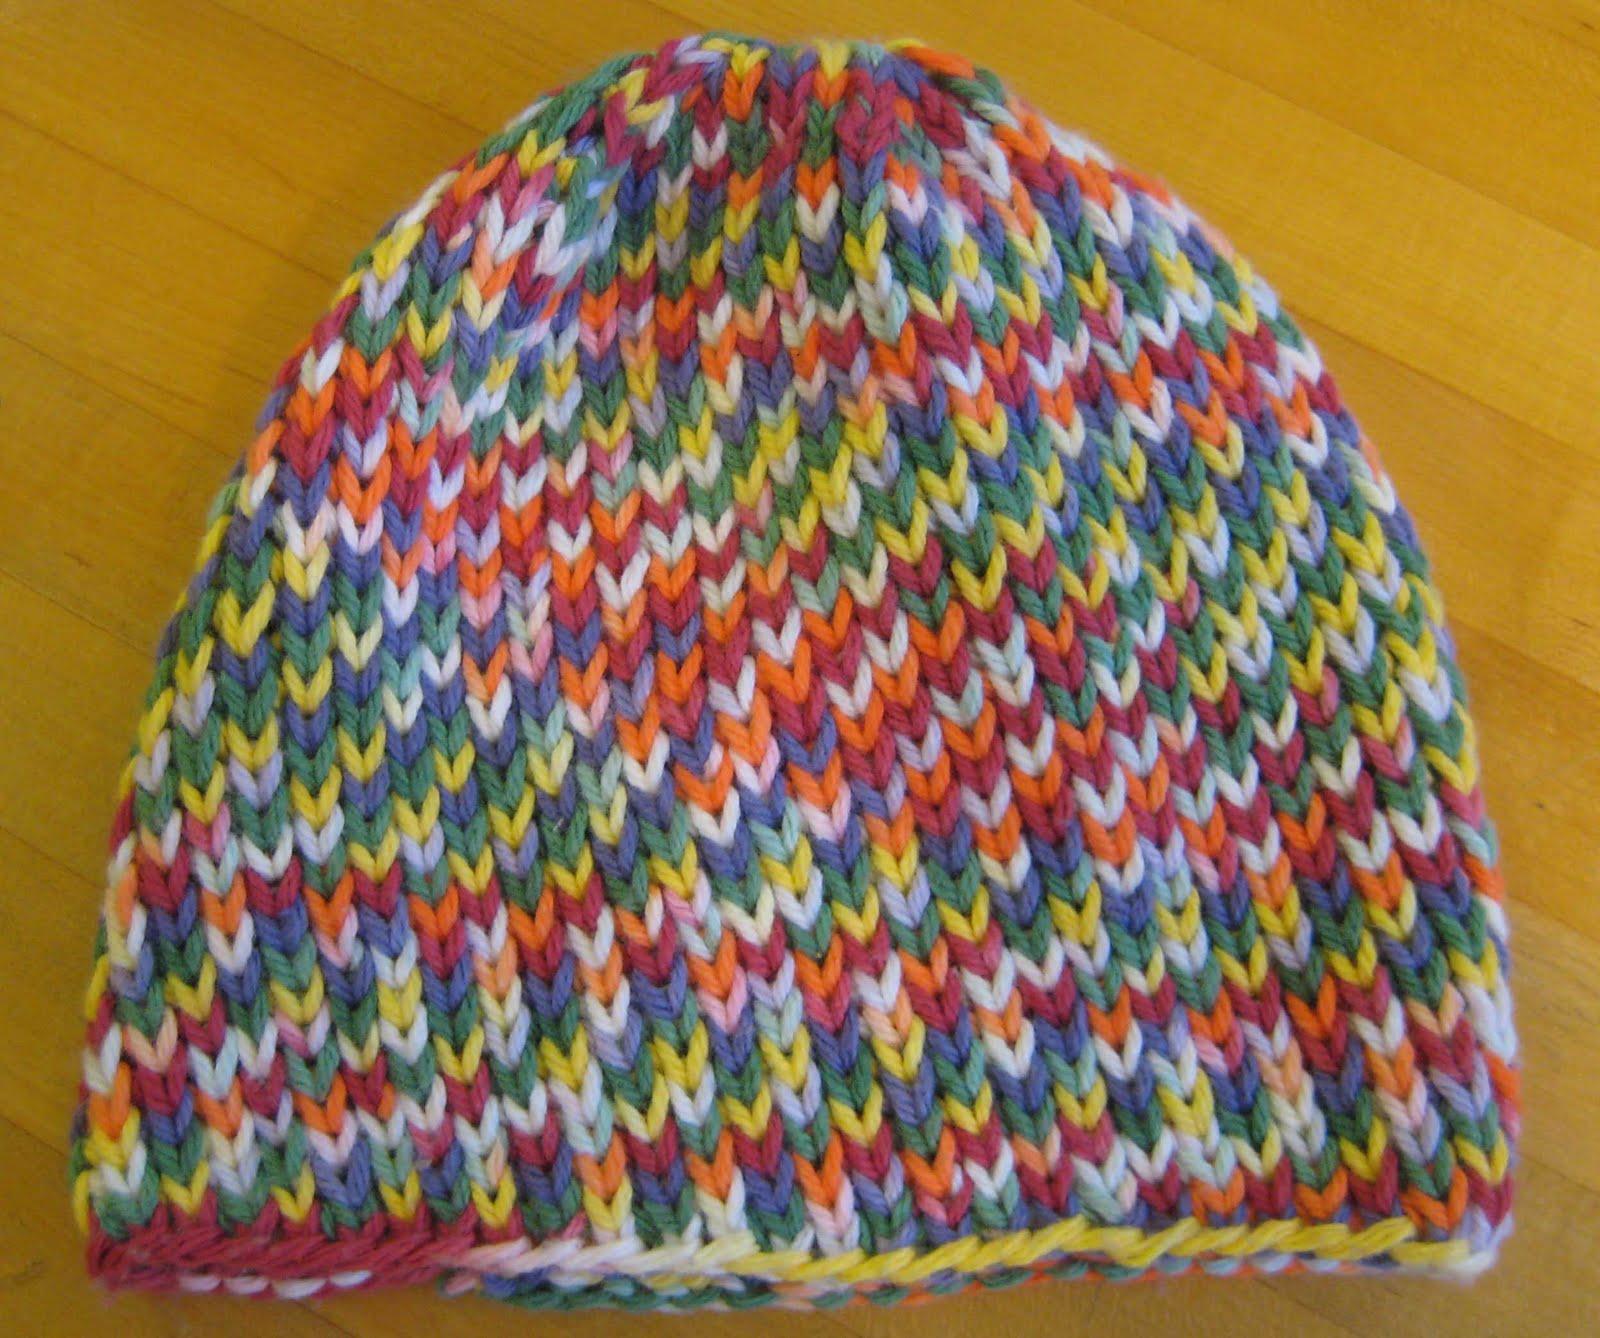 035ffd907ed Free Knitting Patterns for Babies  9 Free Baby Knitting Patterns